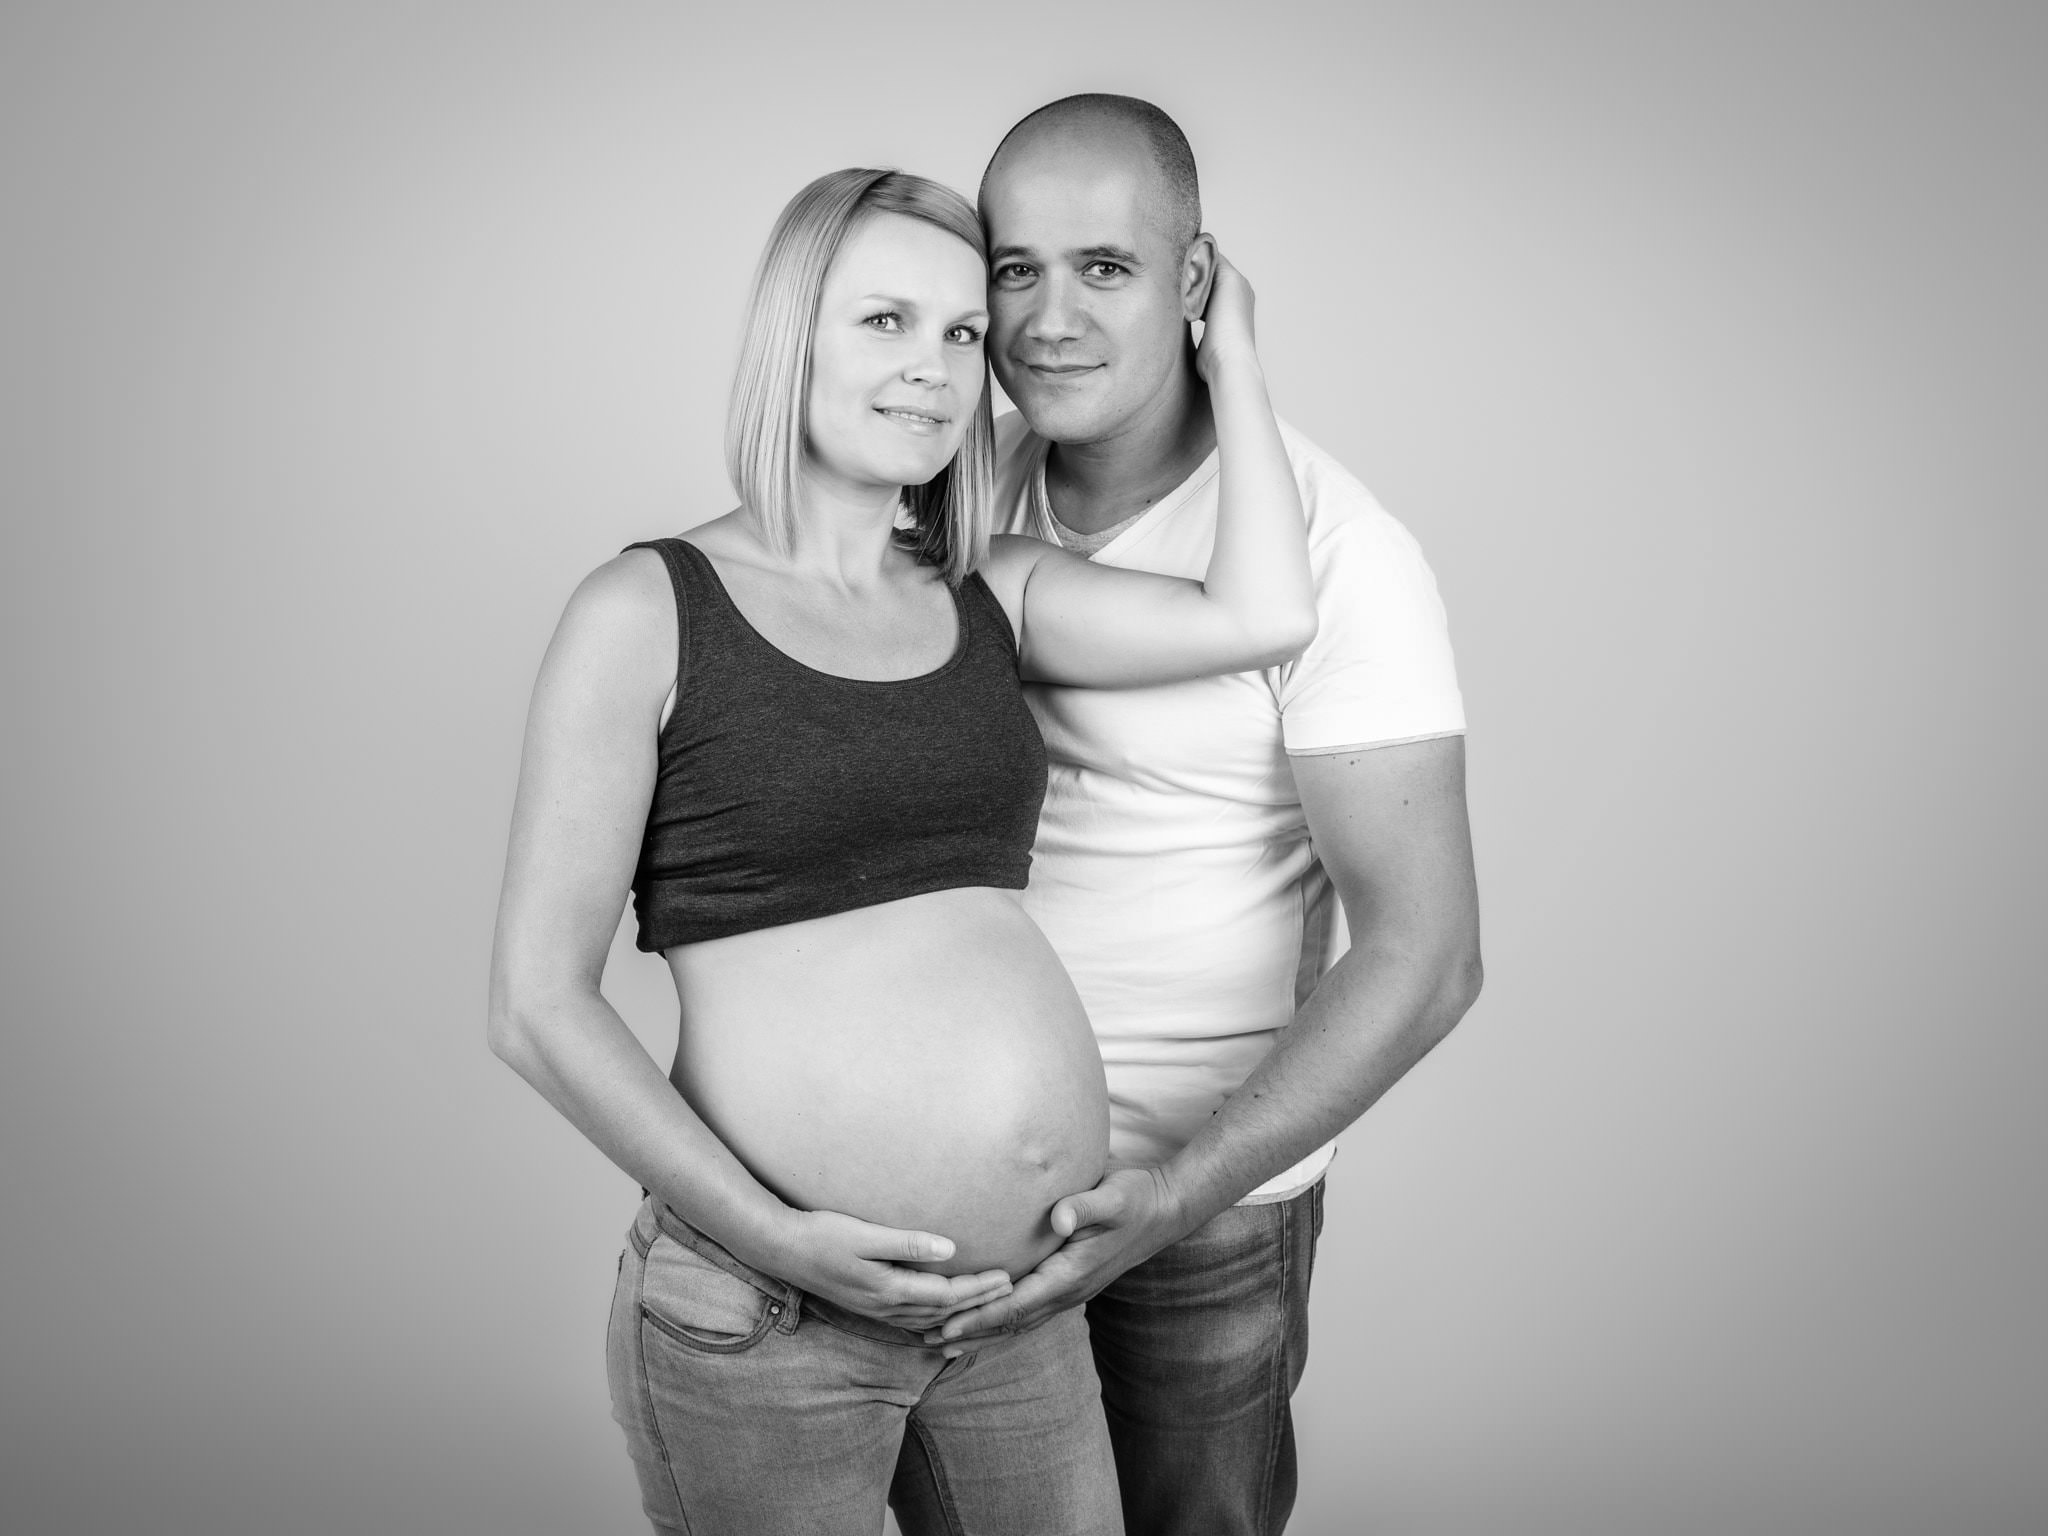 Zwangerschapsfotoshoot in studio arnhem dikke buik fotografie 03